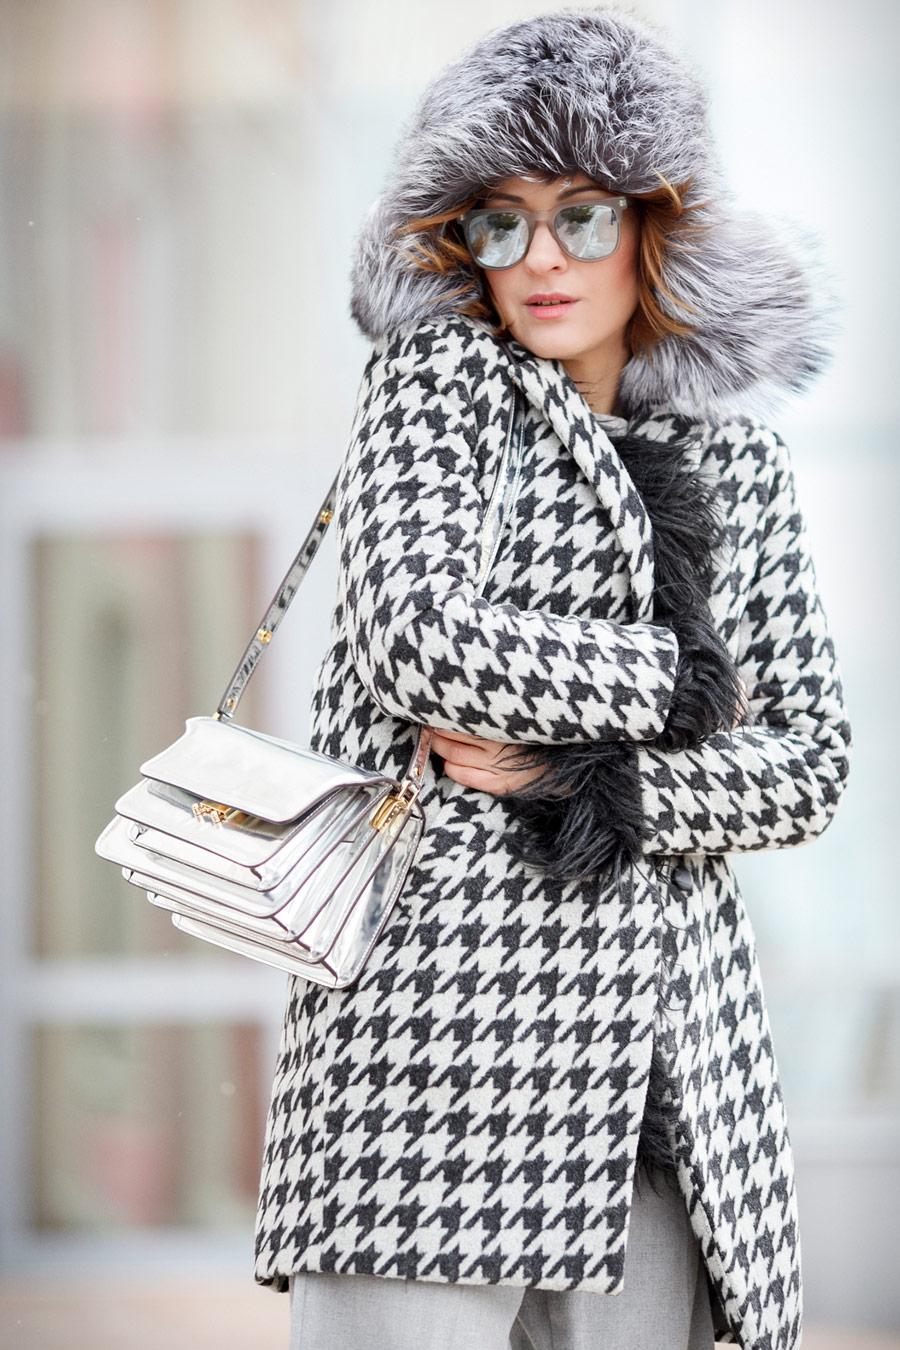 cold weather outfit, cold weather outfit ideas, образы на холодную погоду, как одеться тепло и стильно, образы на охолодную зиму, луки для холодной зимы, Елена Галант, marni trunk bag outfit,